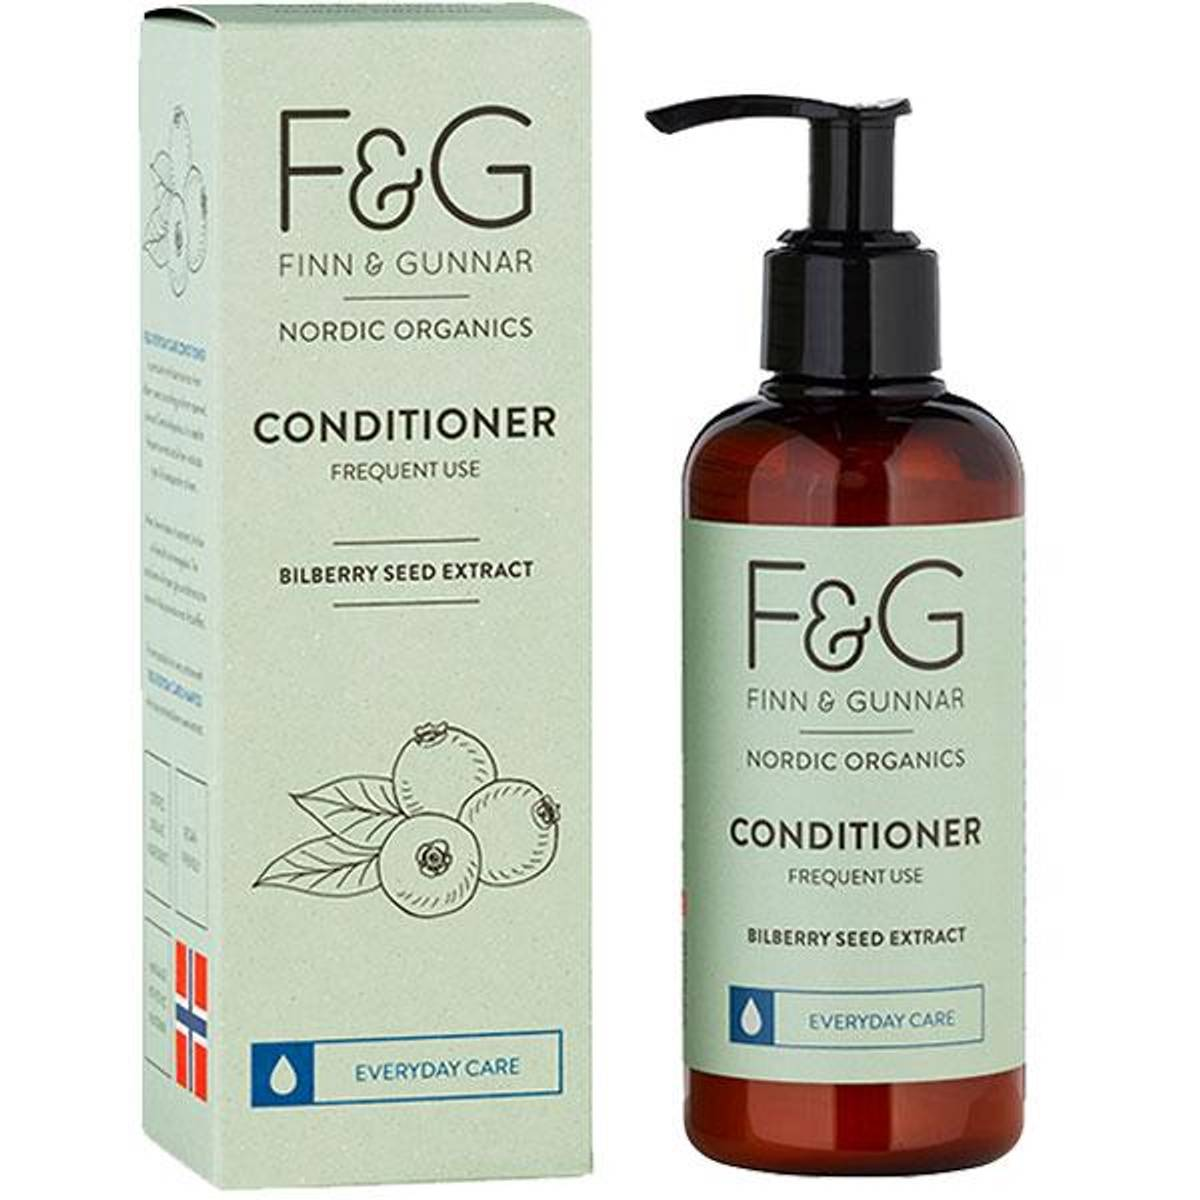 F&G Nordic Organics Conditioner Frequent Use 200 ml